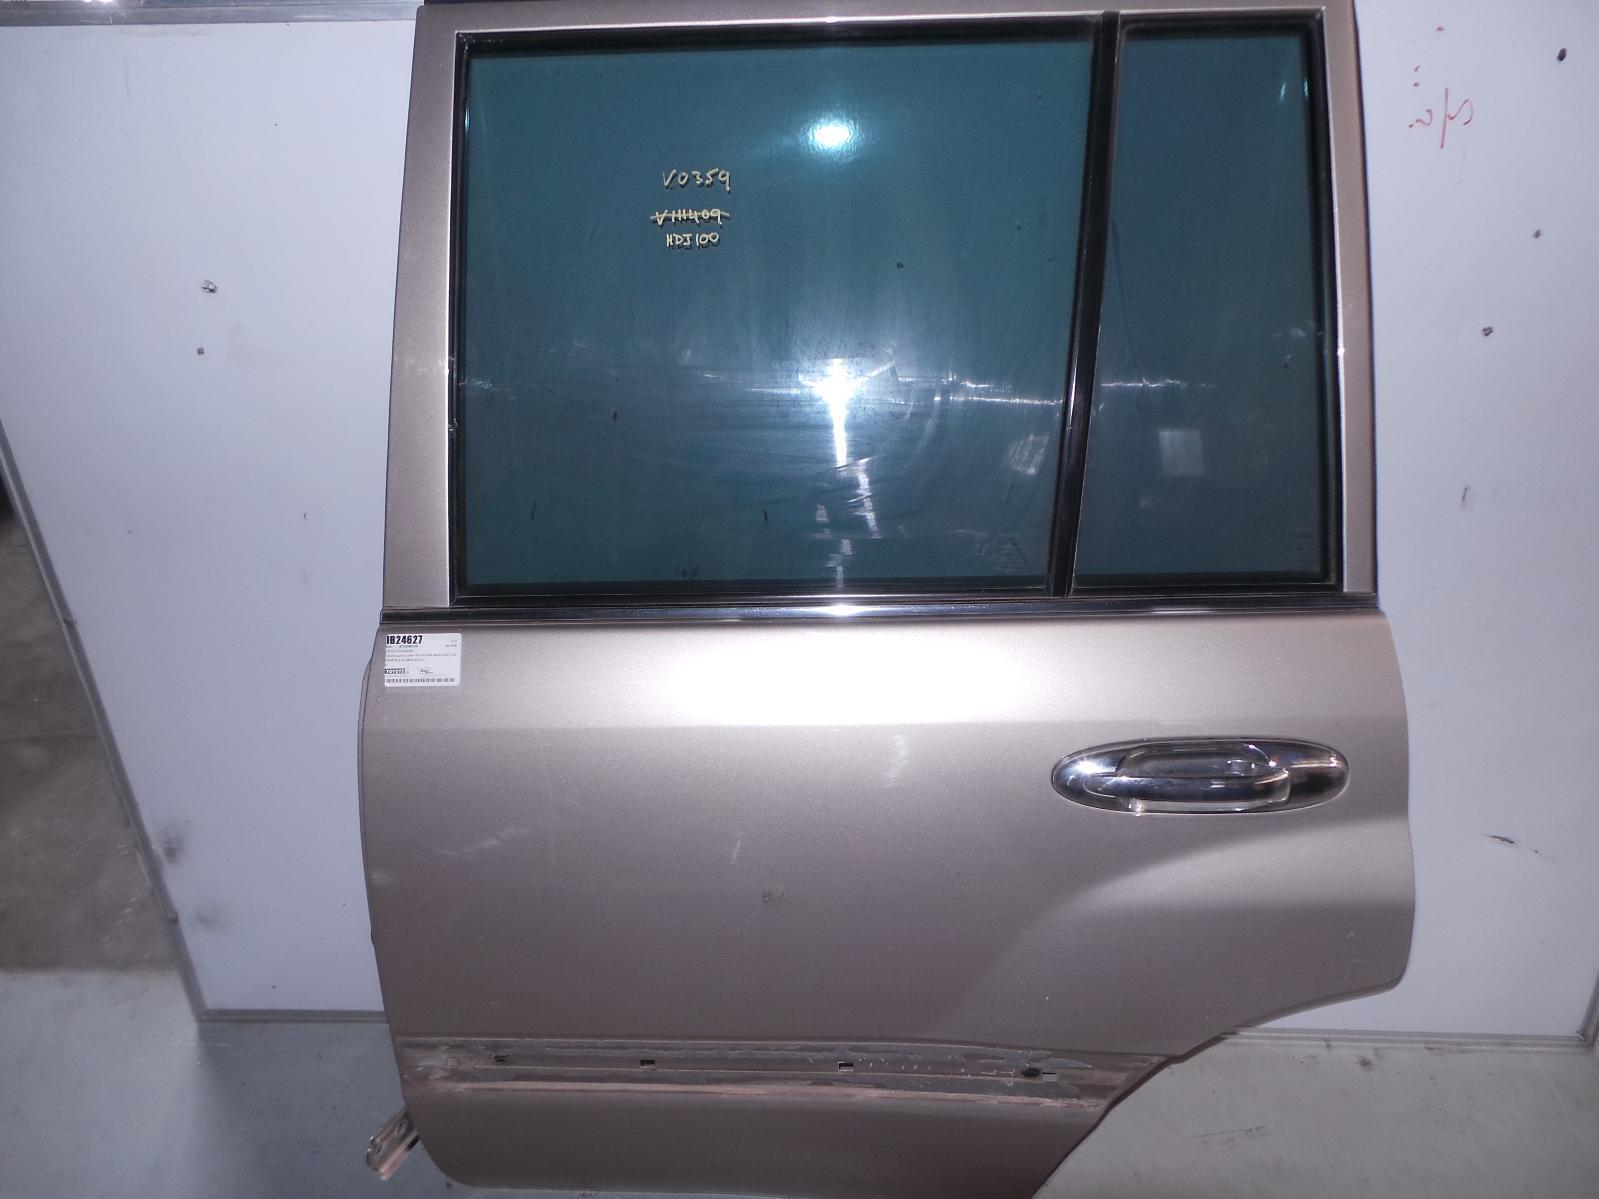 TOYOTA LANDCRUISER, Left Rear Door/Sliding, 100 SERIES, GXL/SAHARA, MOULD TYPE, 01/98-10/07